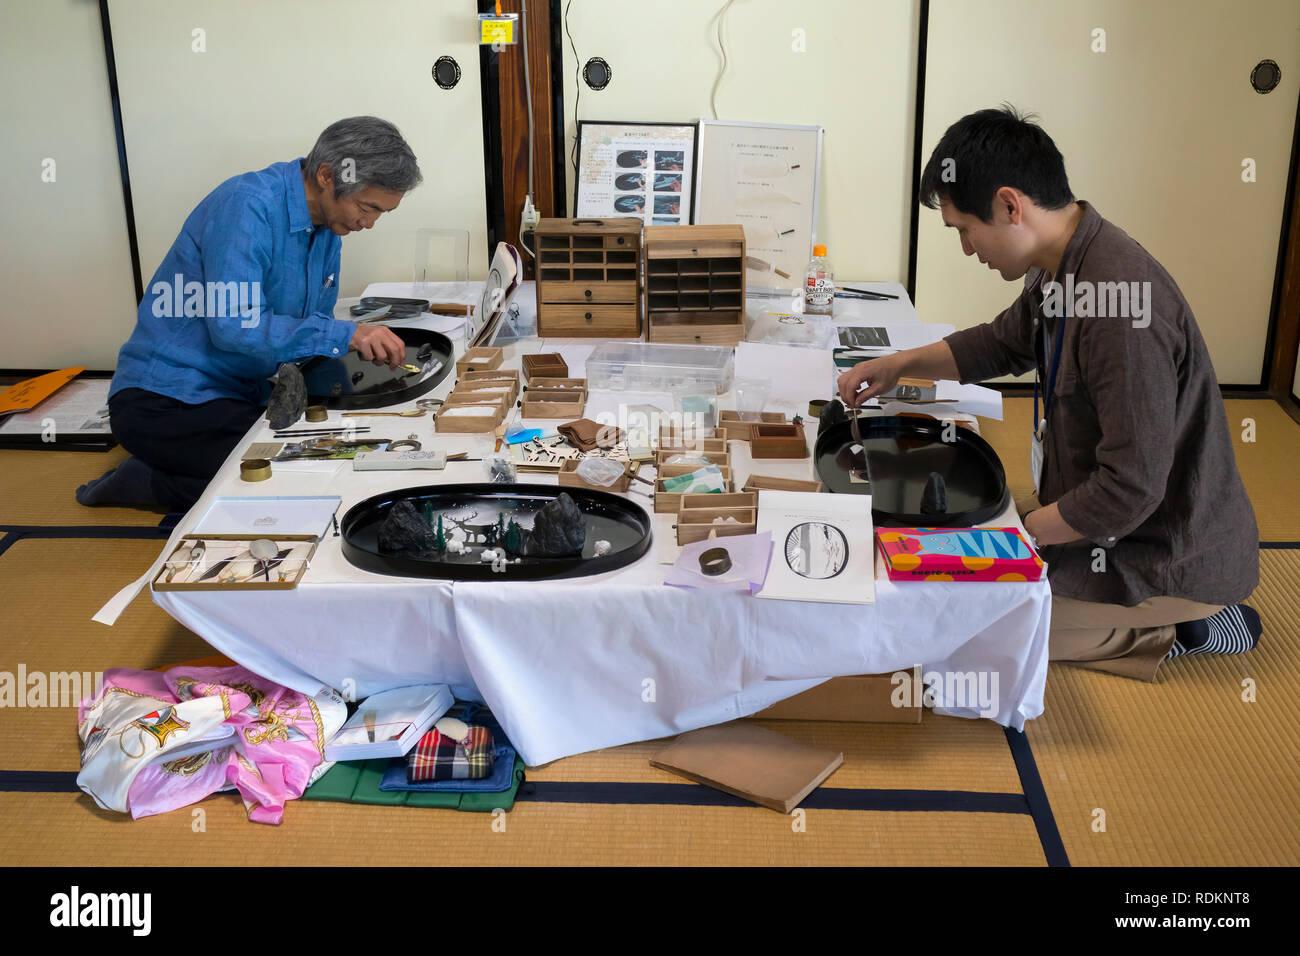 Kumamoto, Japan - November 11, 2018: Artists are creating Bonseki, tray rocks, an ancient Japanese art of miniature landscapes - Stock Image